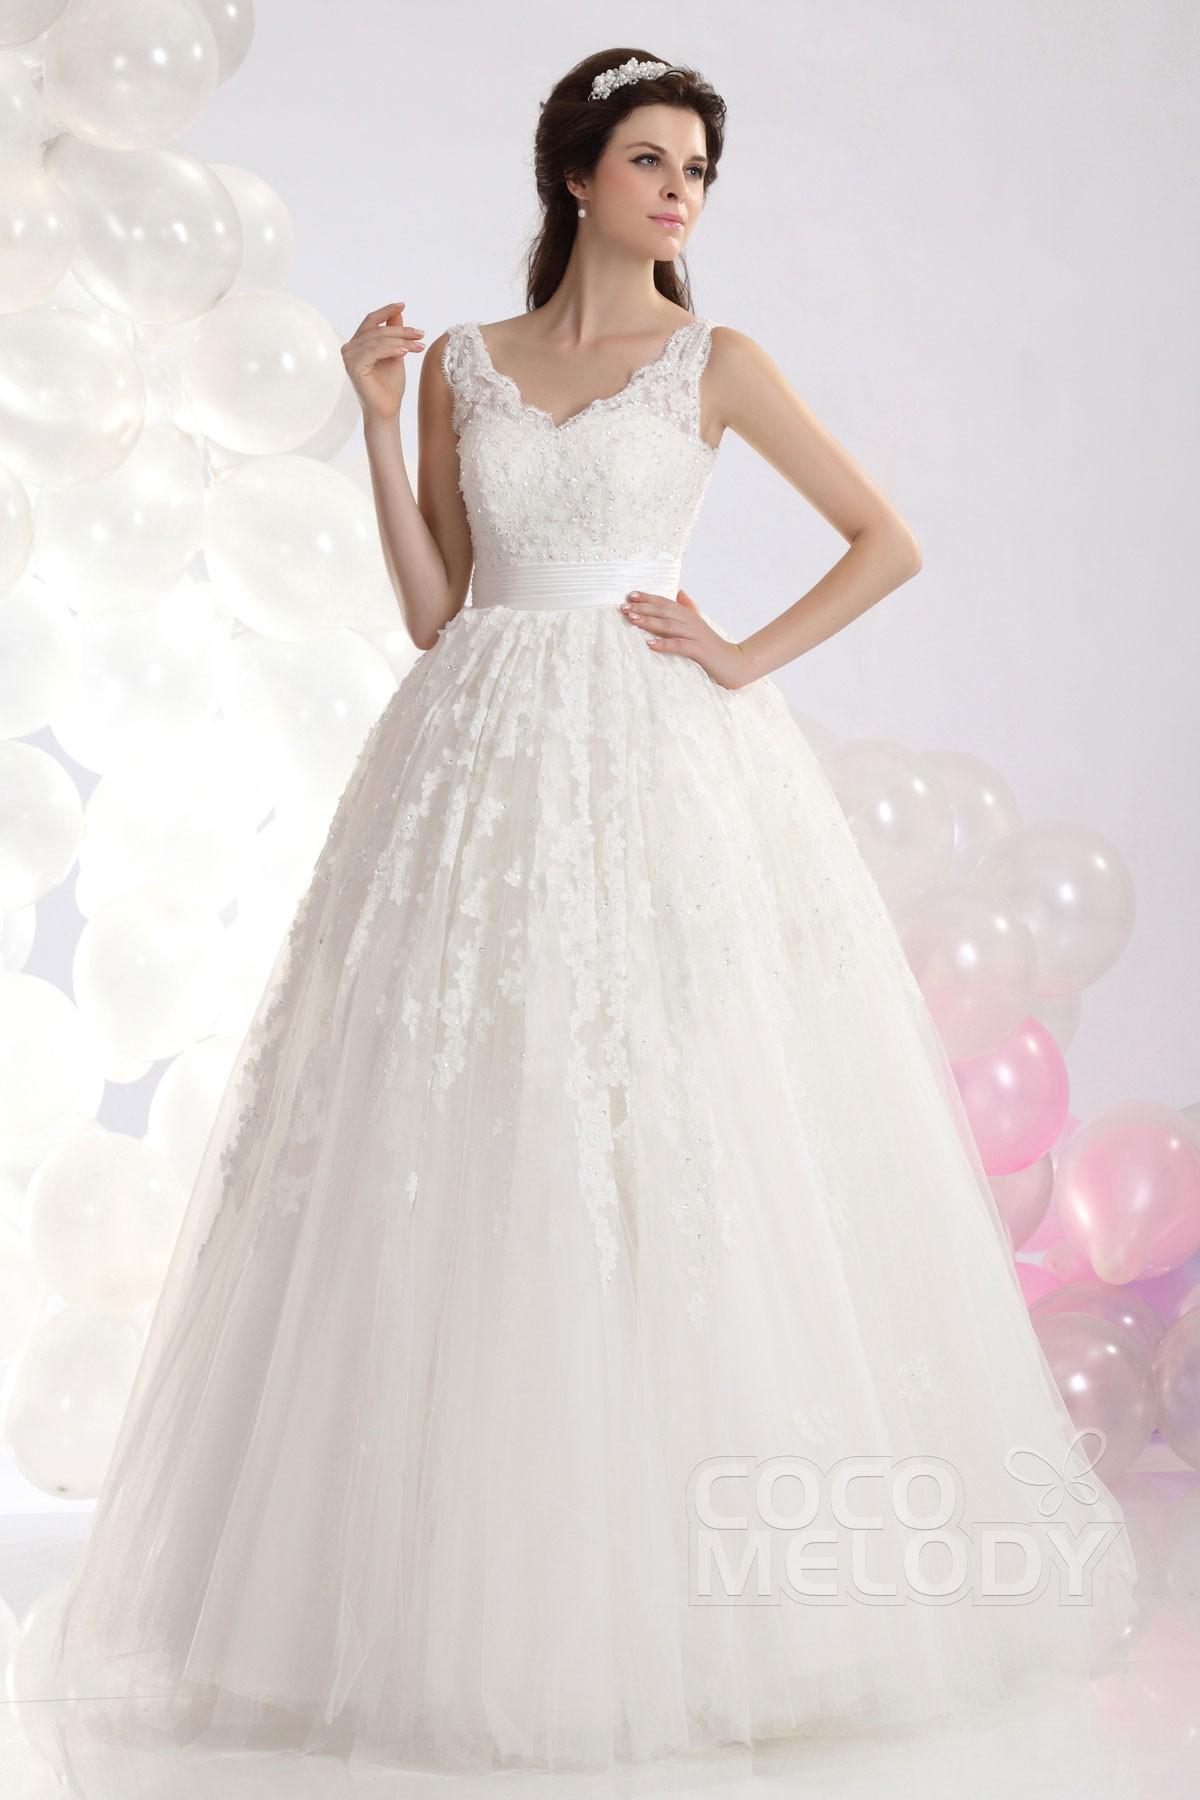 Cocomelody: Princess V-Neck Natural Floor Length Tulle Wedding Dress ...